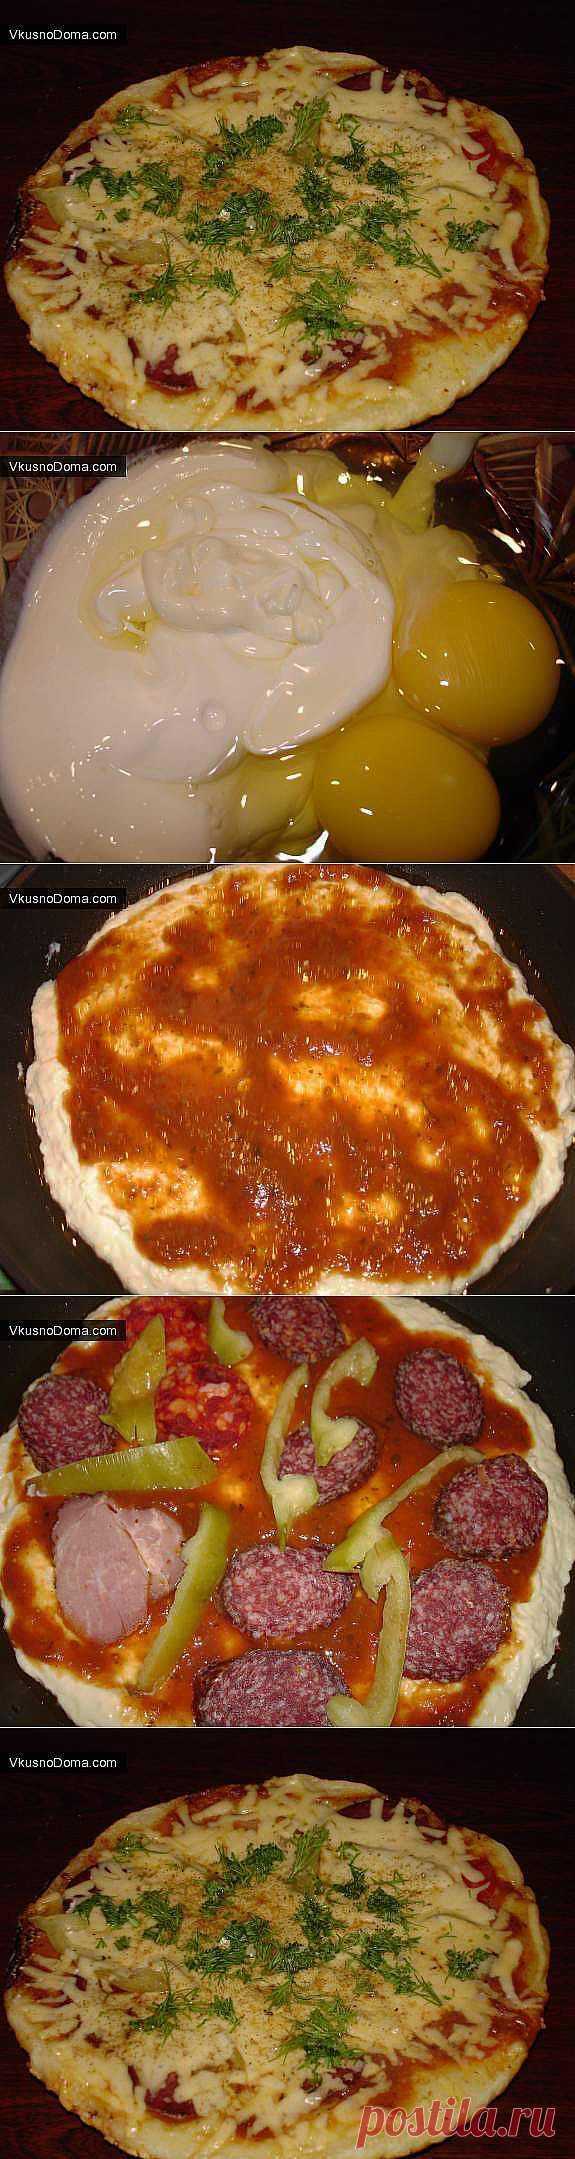 Пицца на сковородке в домашних условиях